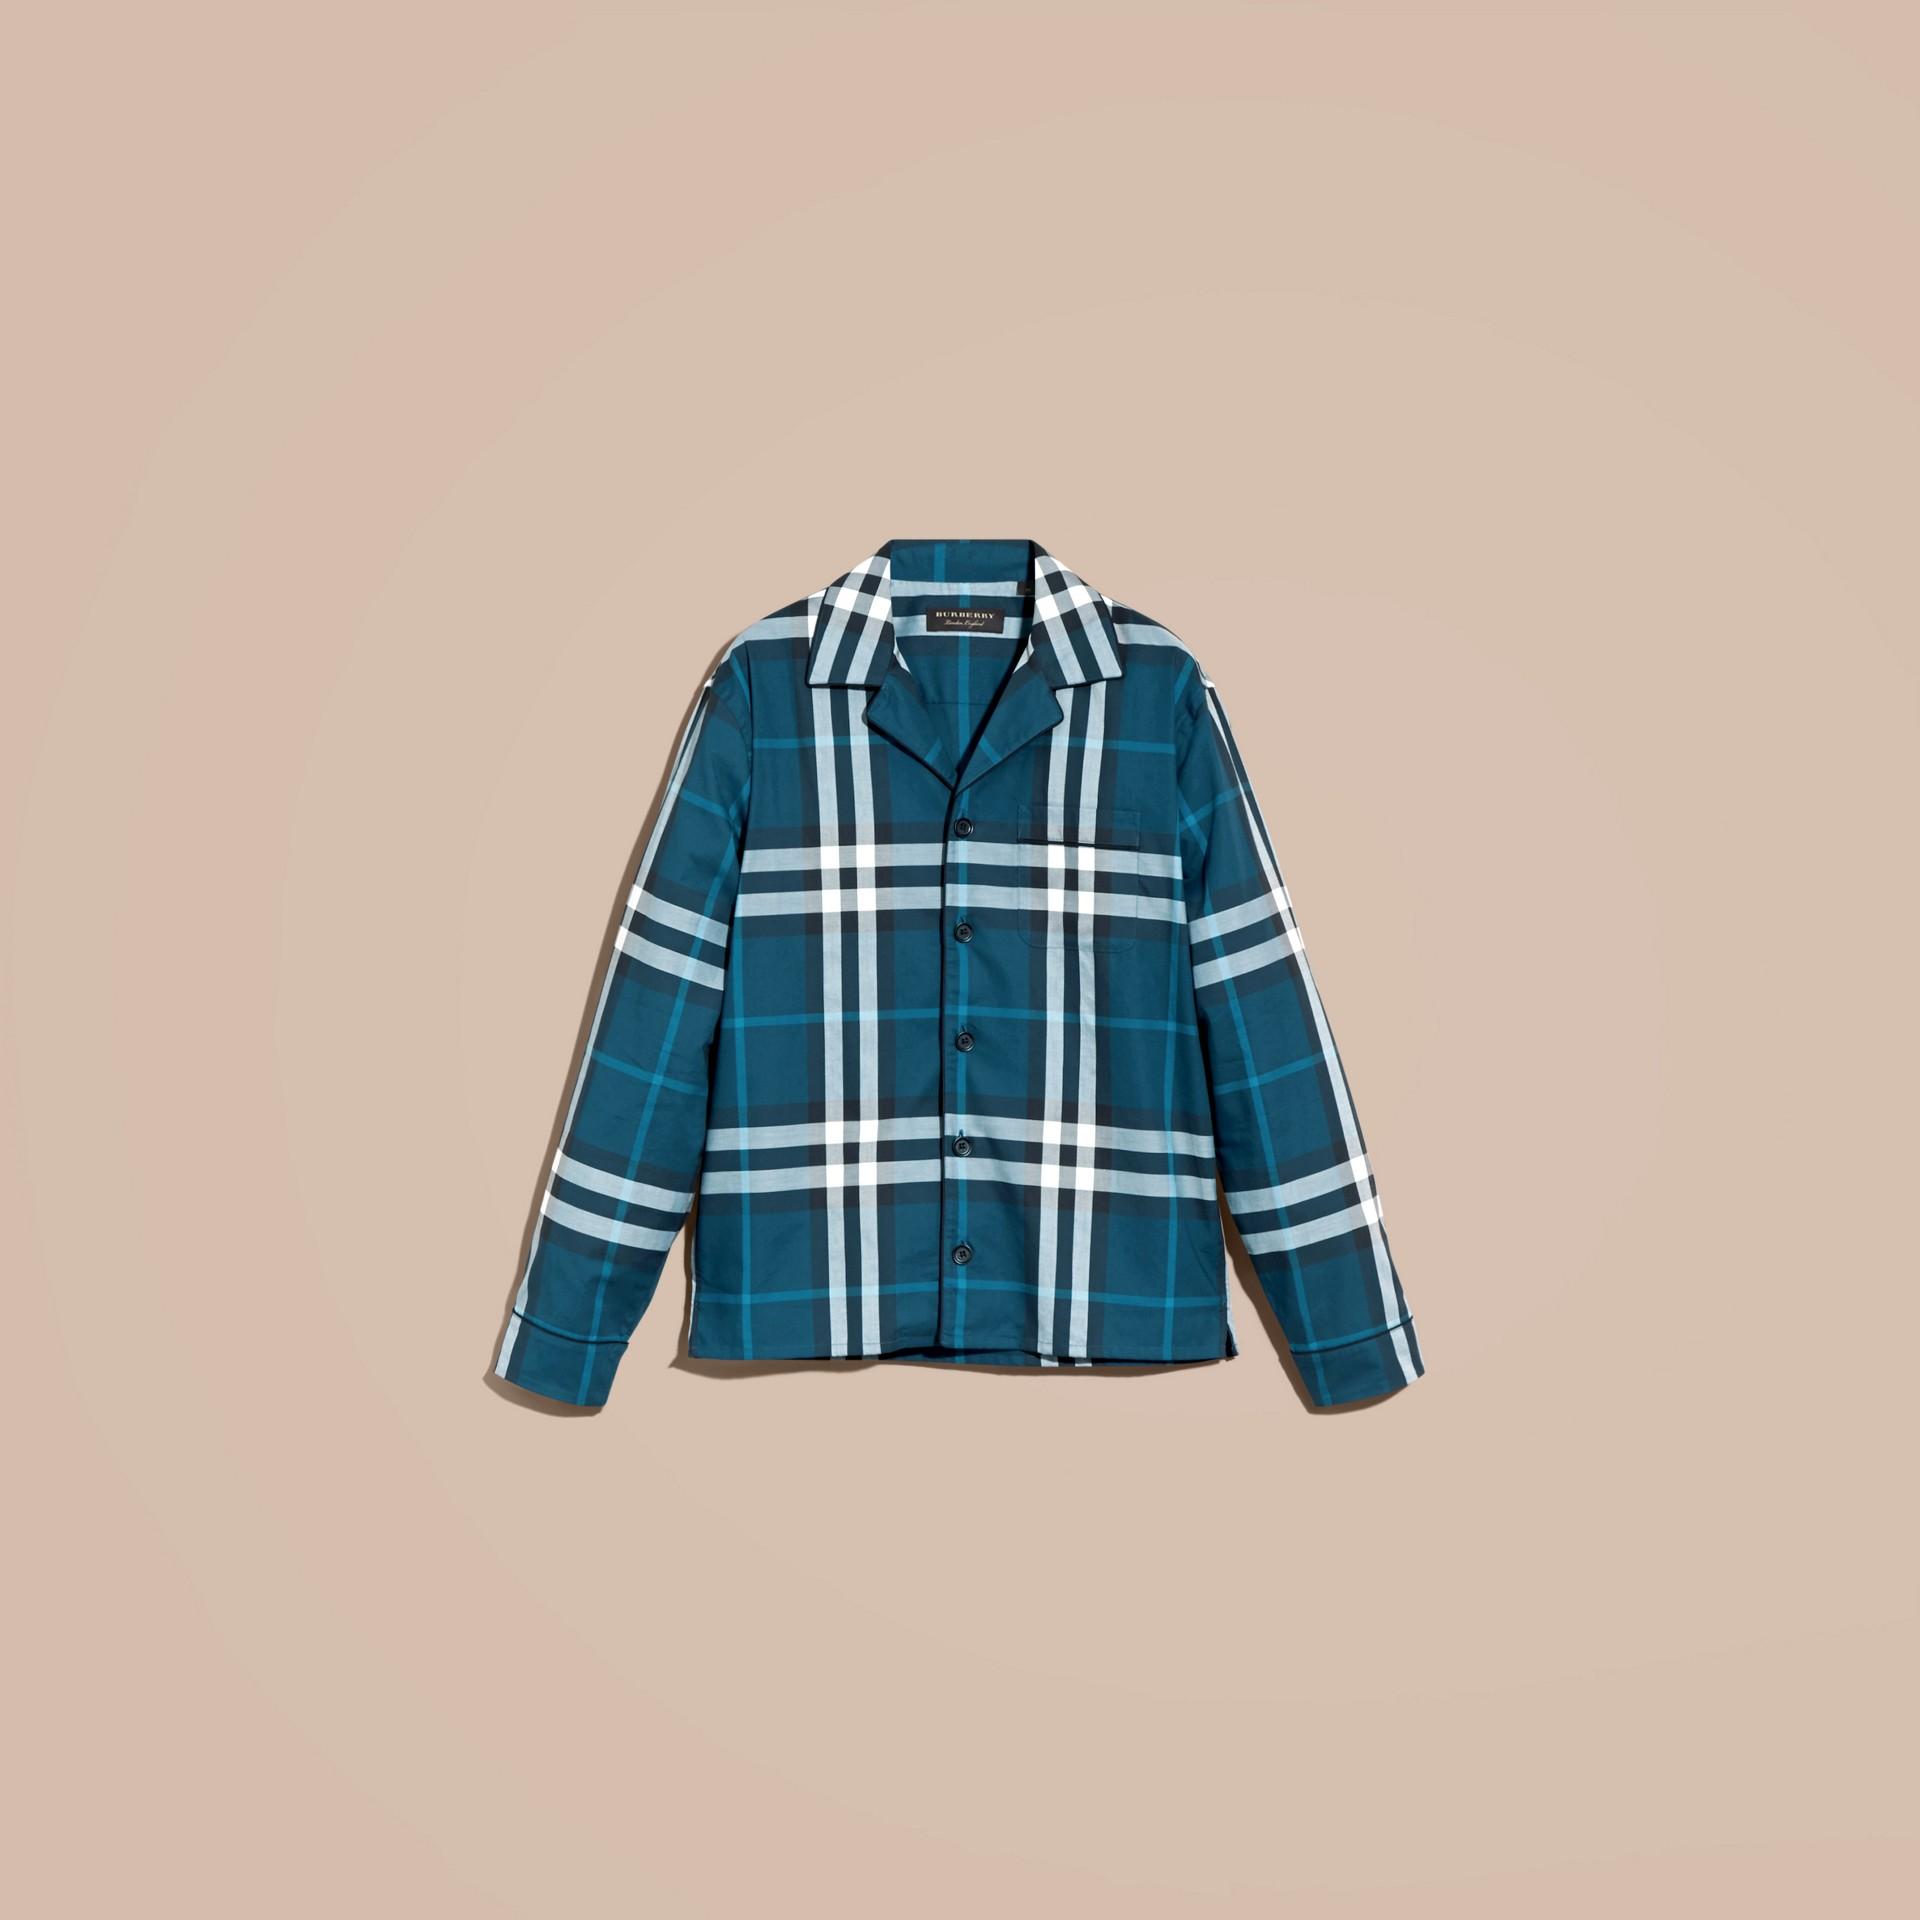 Cadet blue Check Cotton Pyjama-style Shirt Cadet Blue - gallery image 4